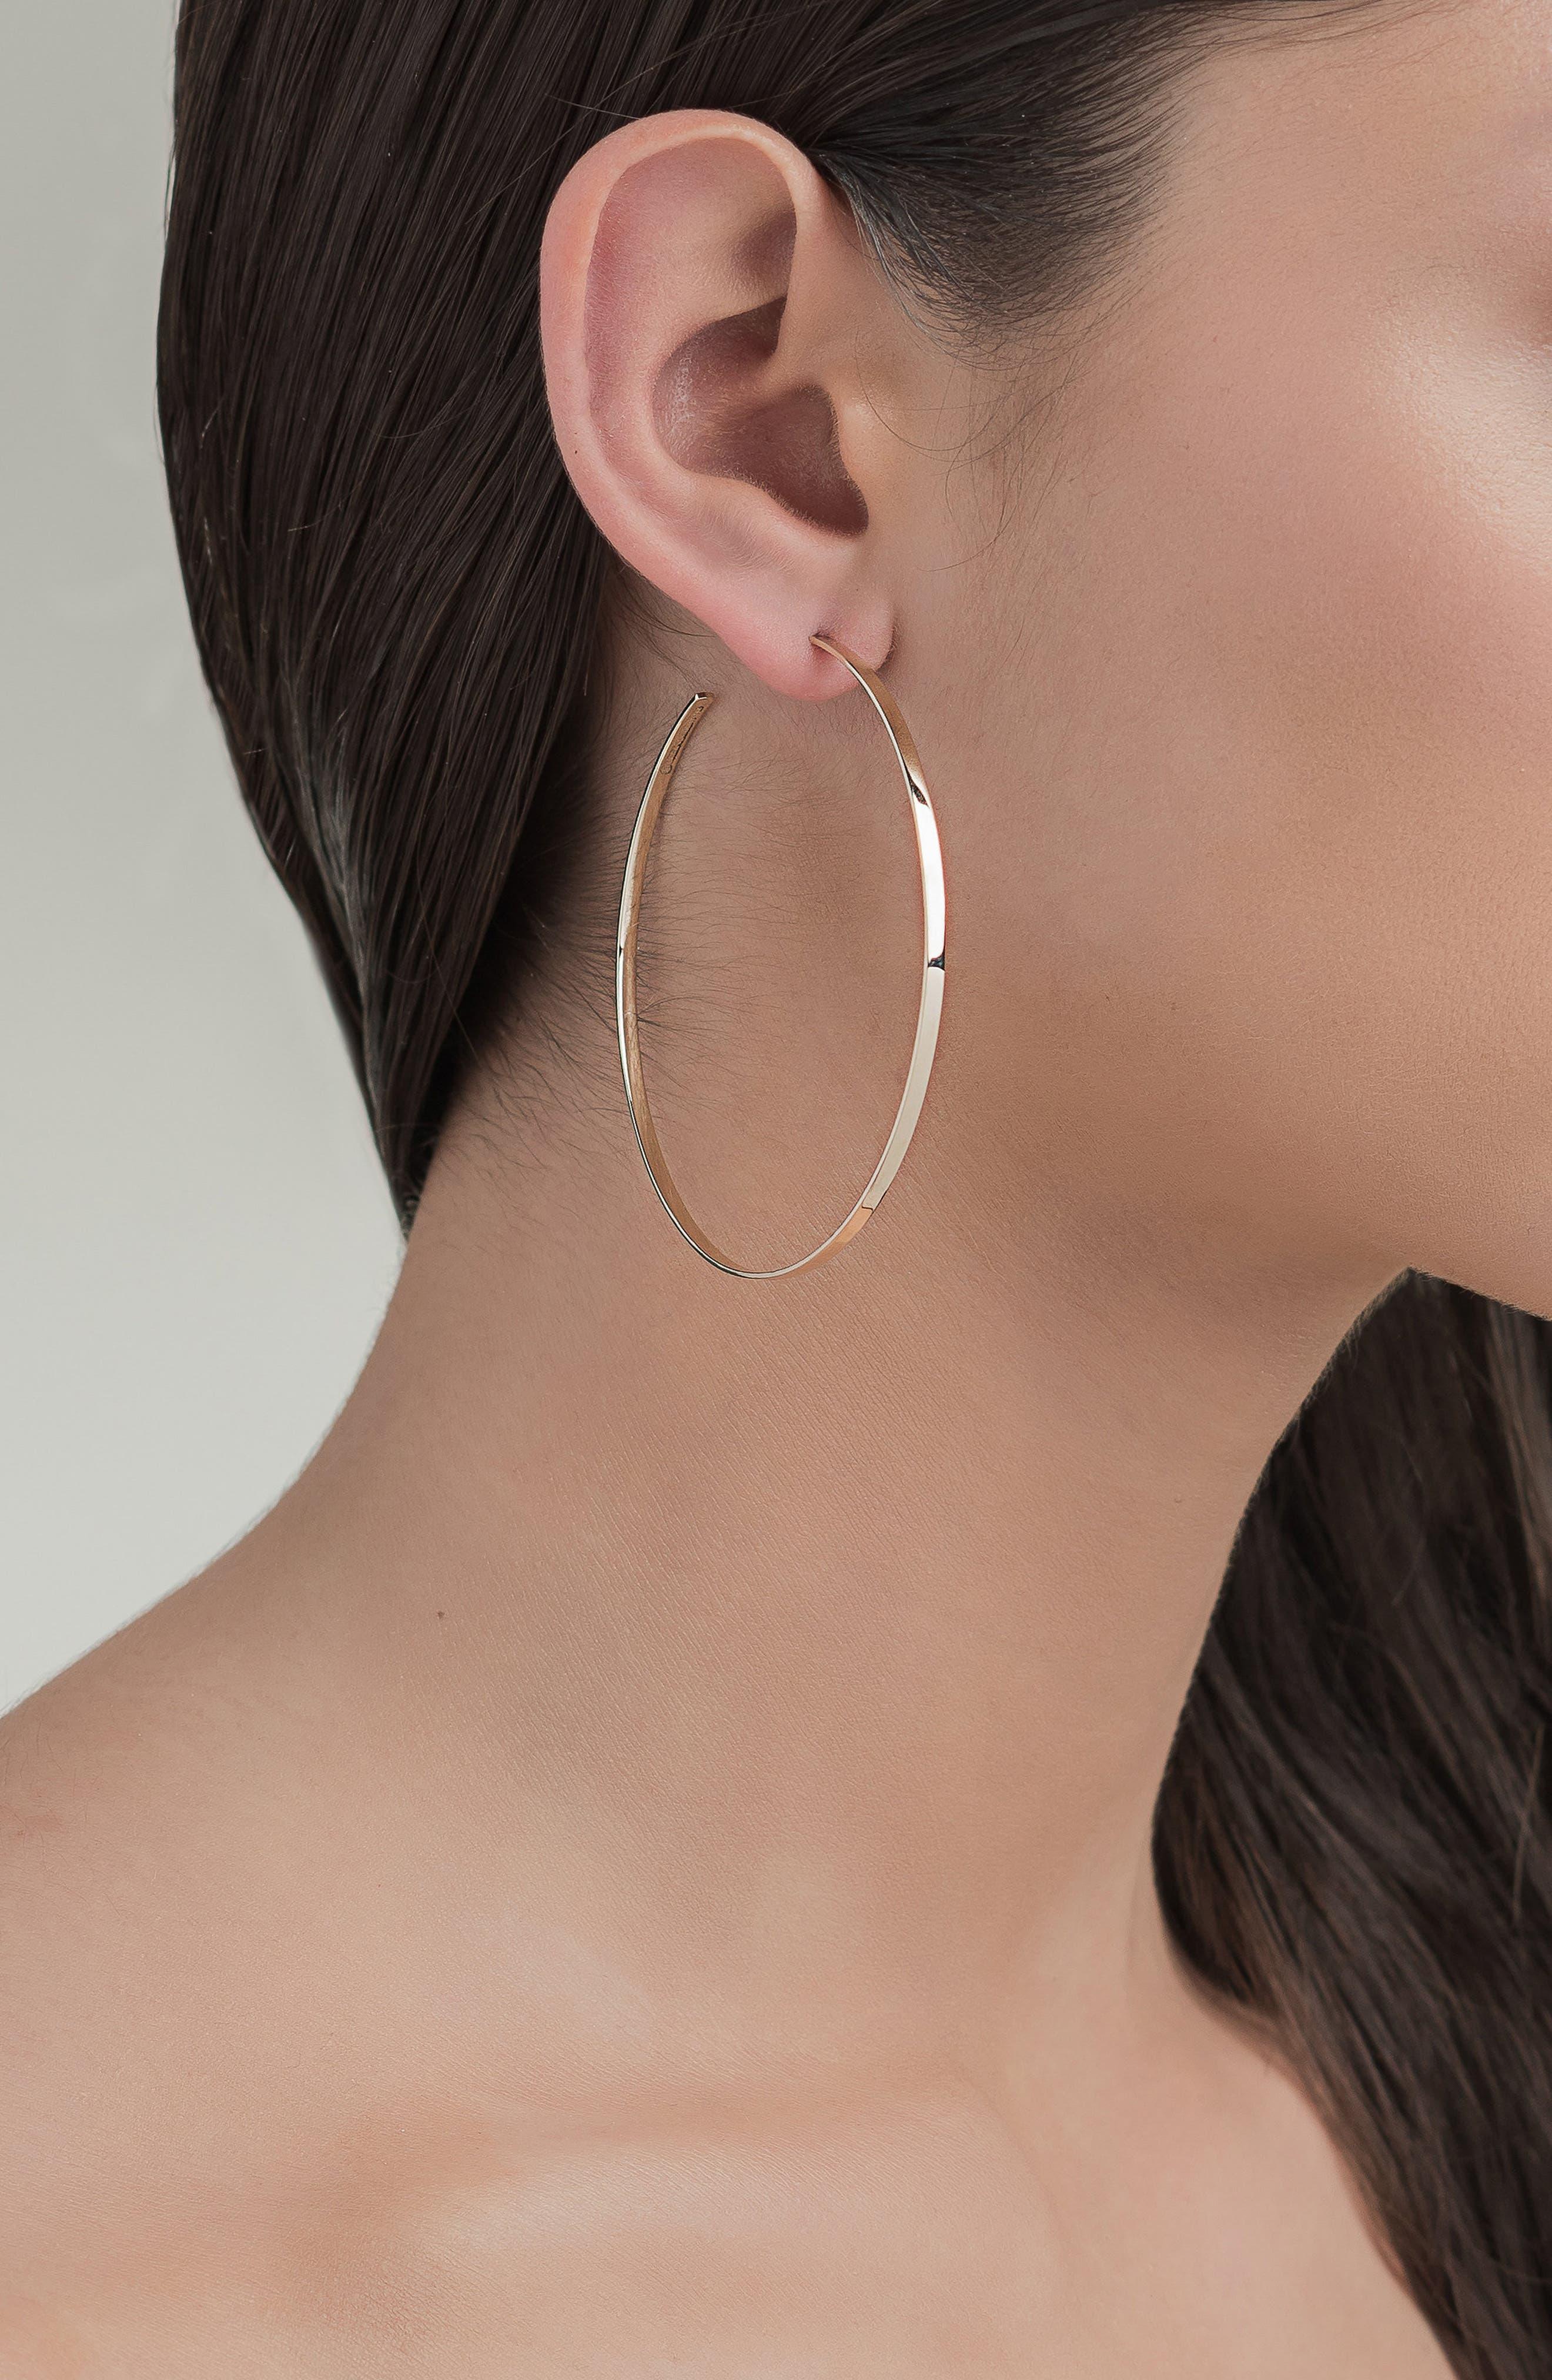 Sunrise Hoop Earrings,                             Alternate thumbnail 2, color,                             YELLOW GOLD